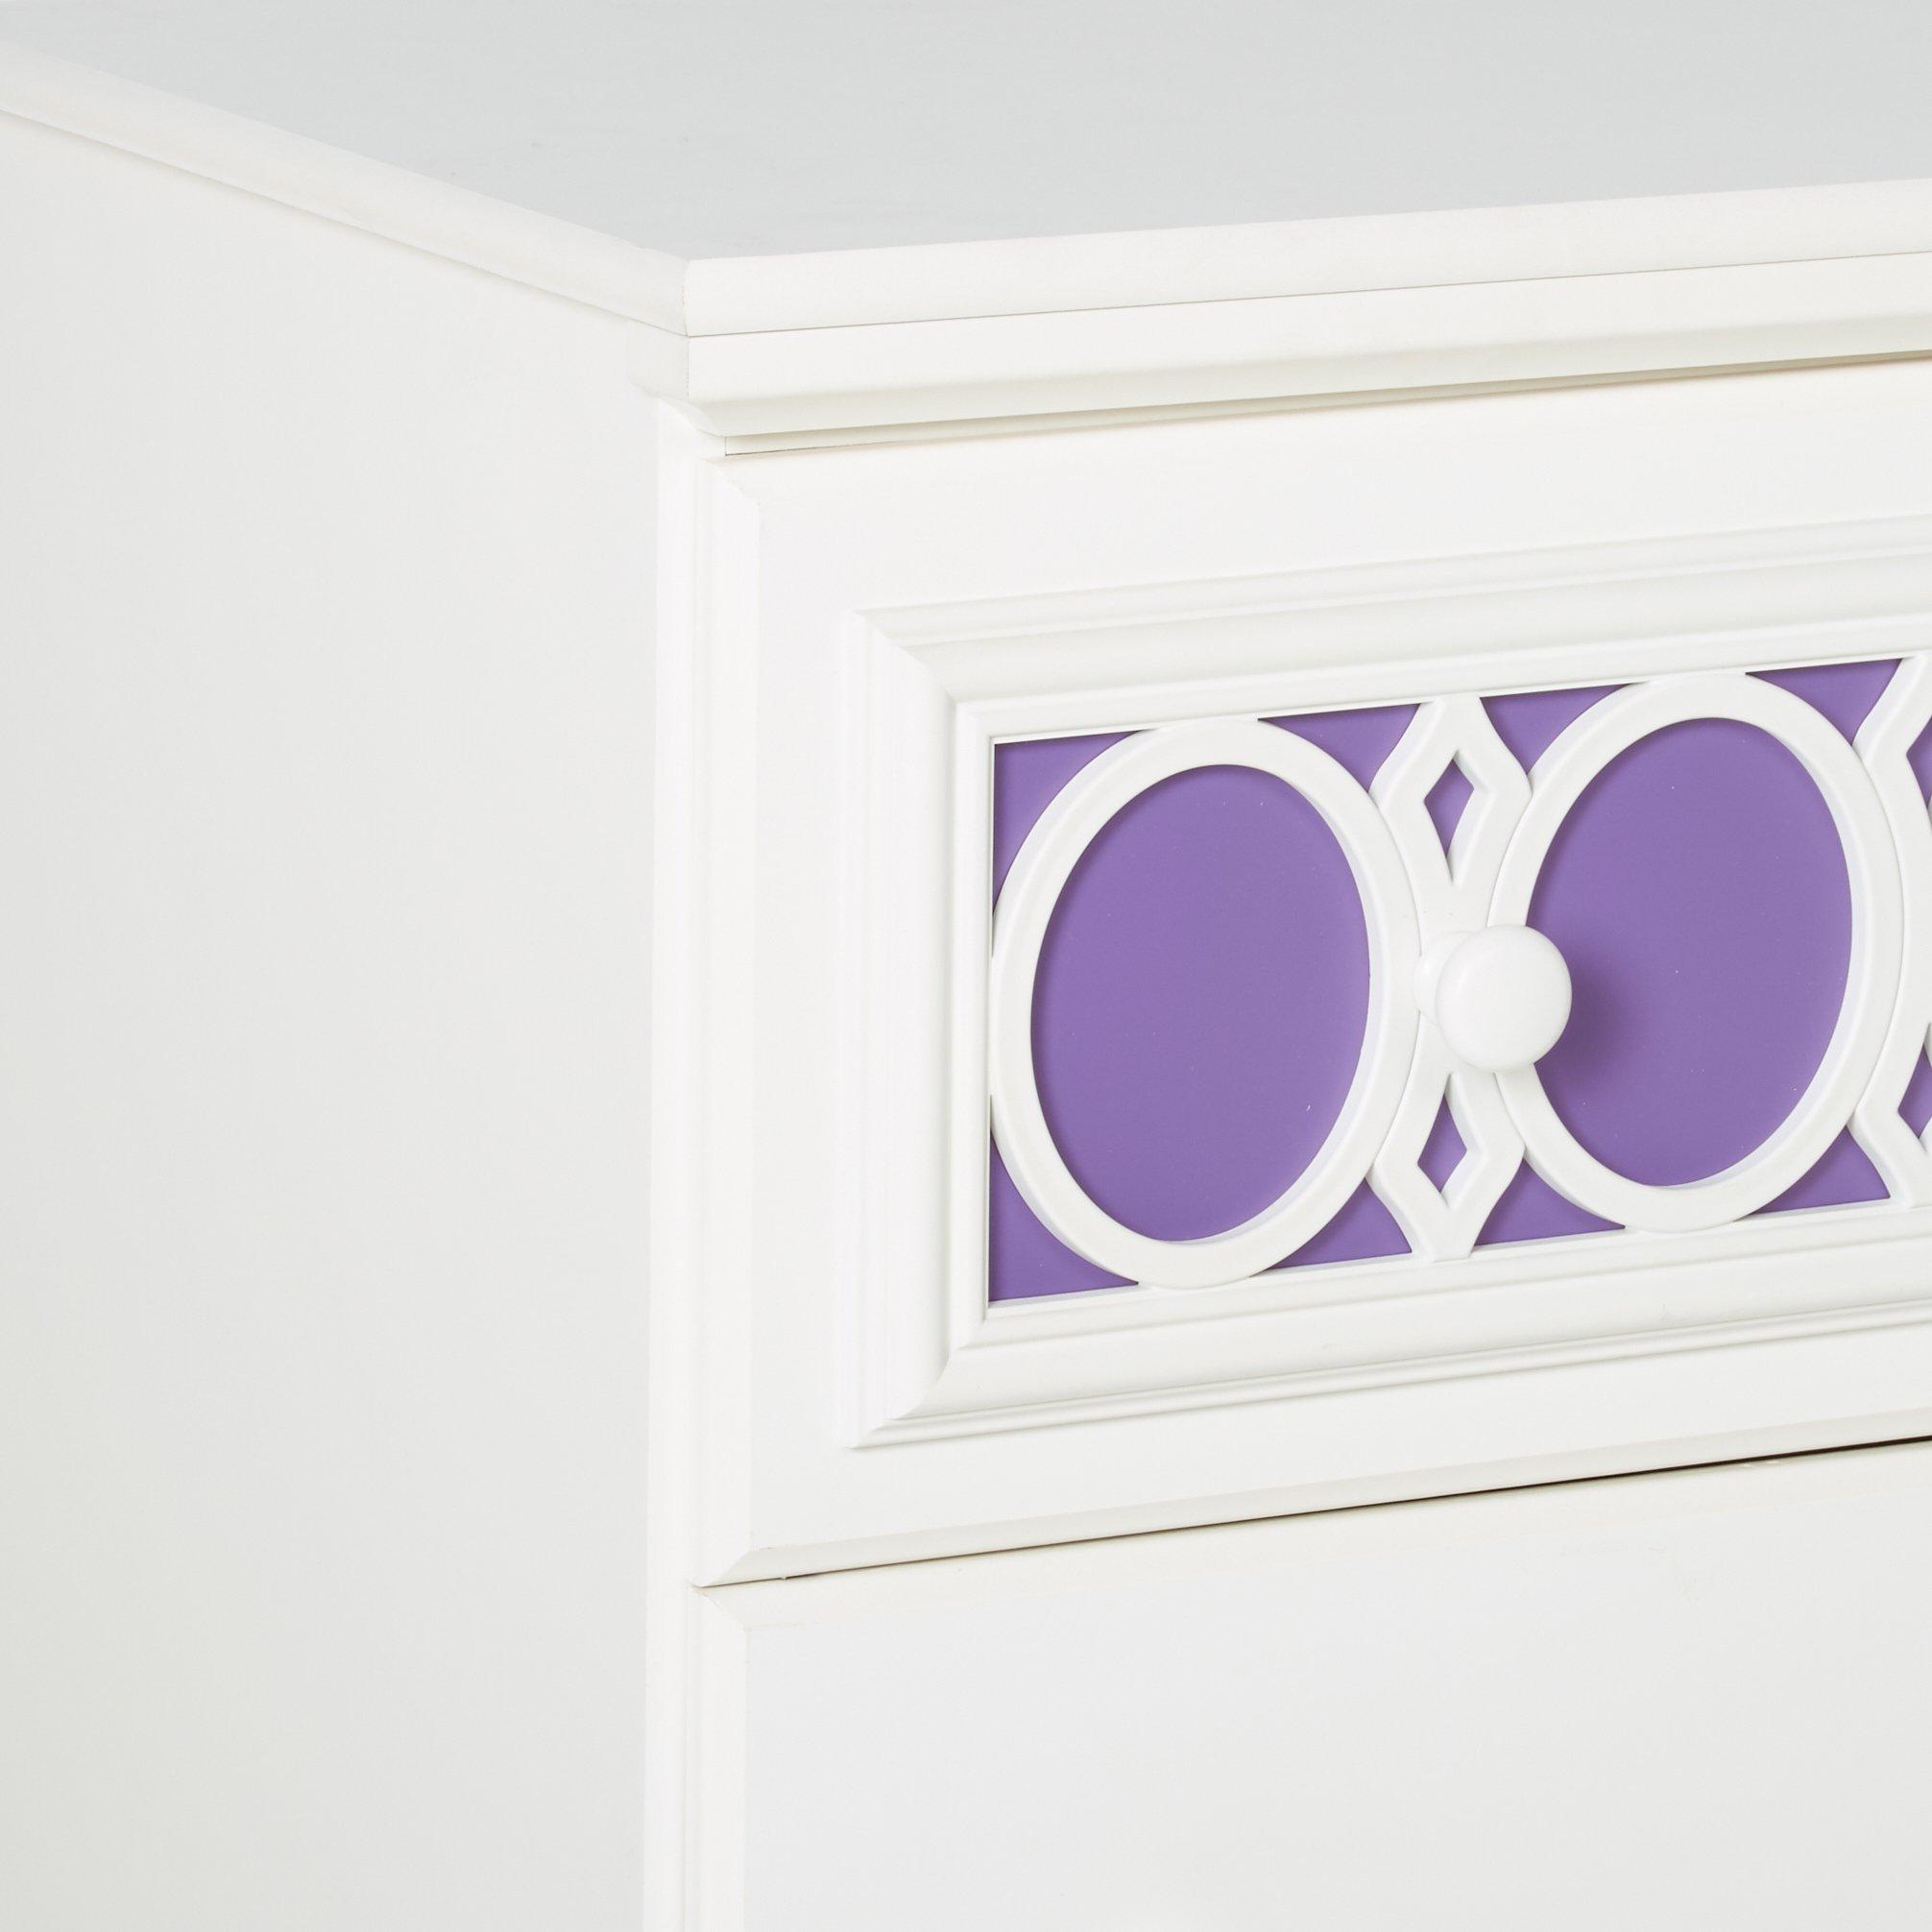 Ashley Furniture Signature Design - Zayley Chest of Drawers - 5 Drawers - Interchangable Panels - Contemporary - White by Signature Design by Ashley (Image #6)